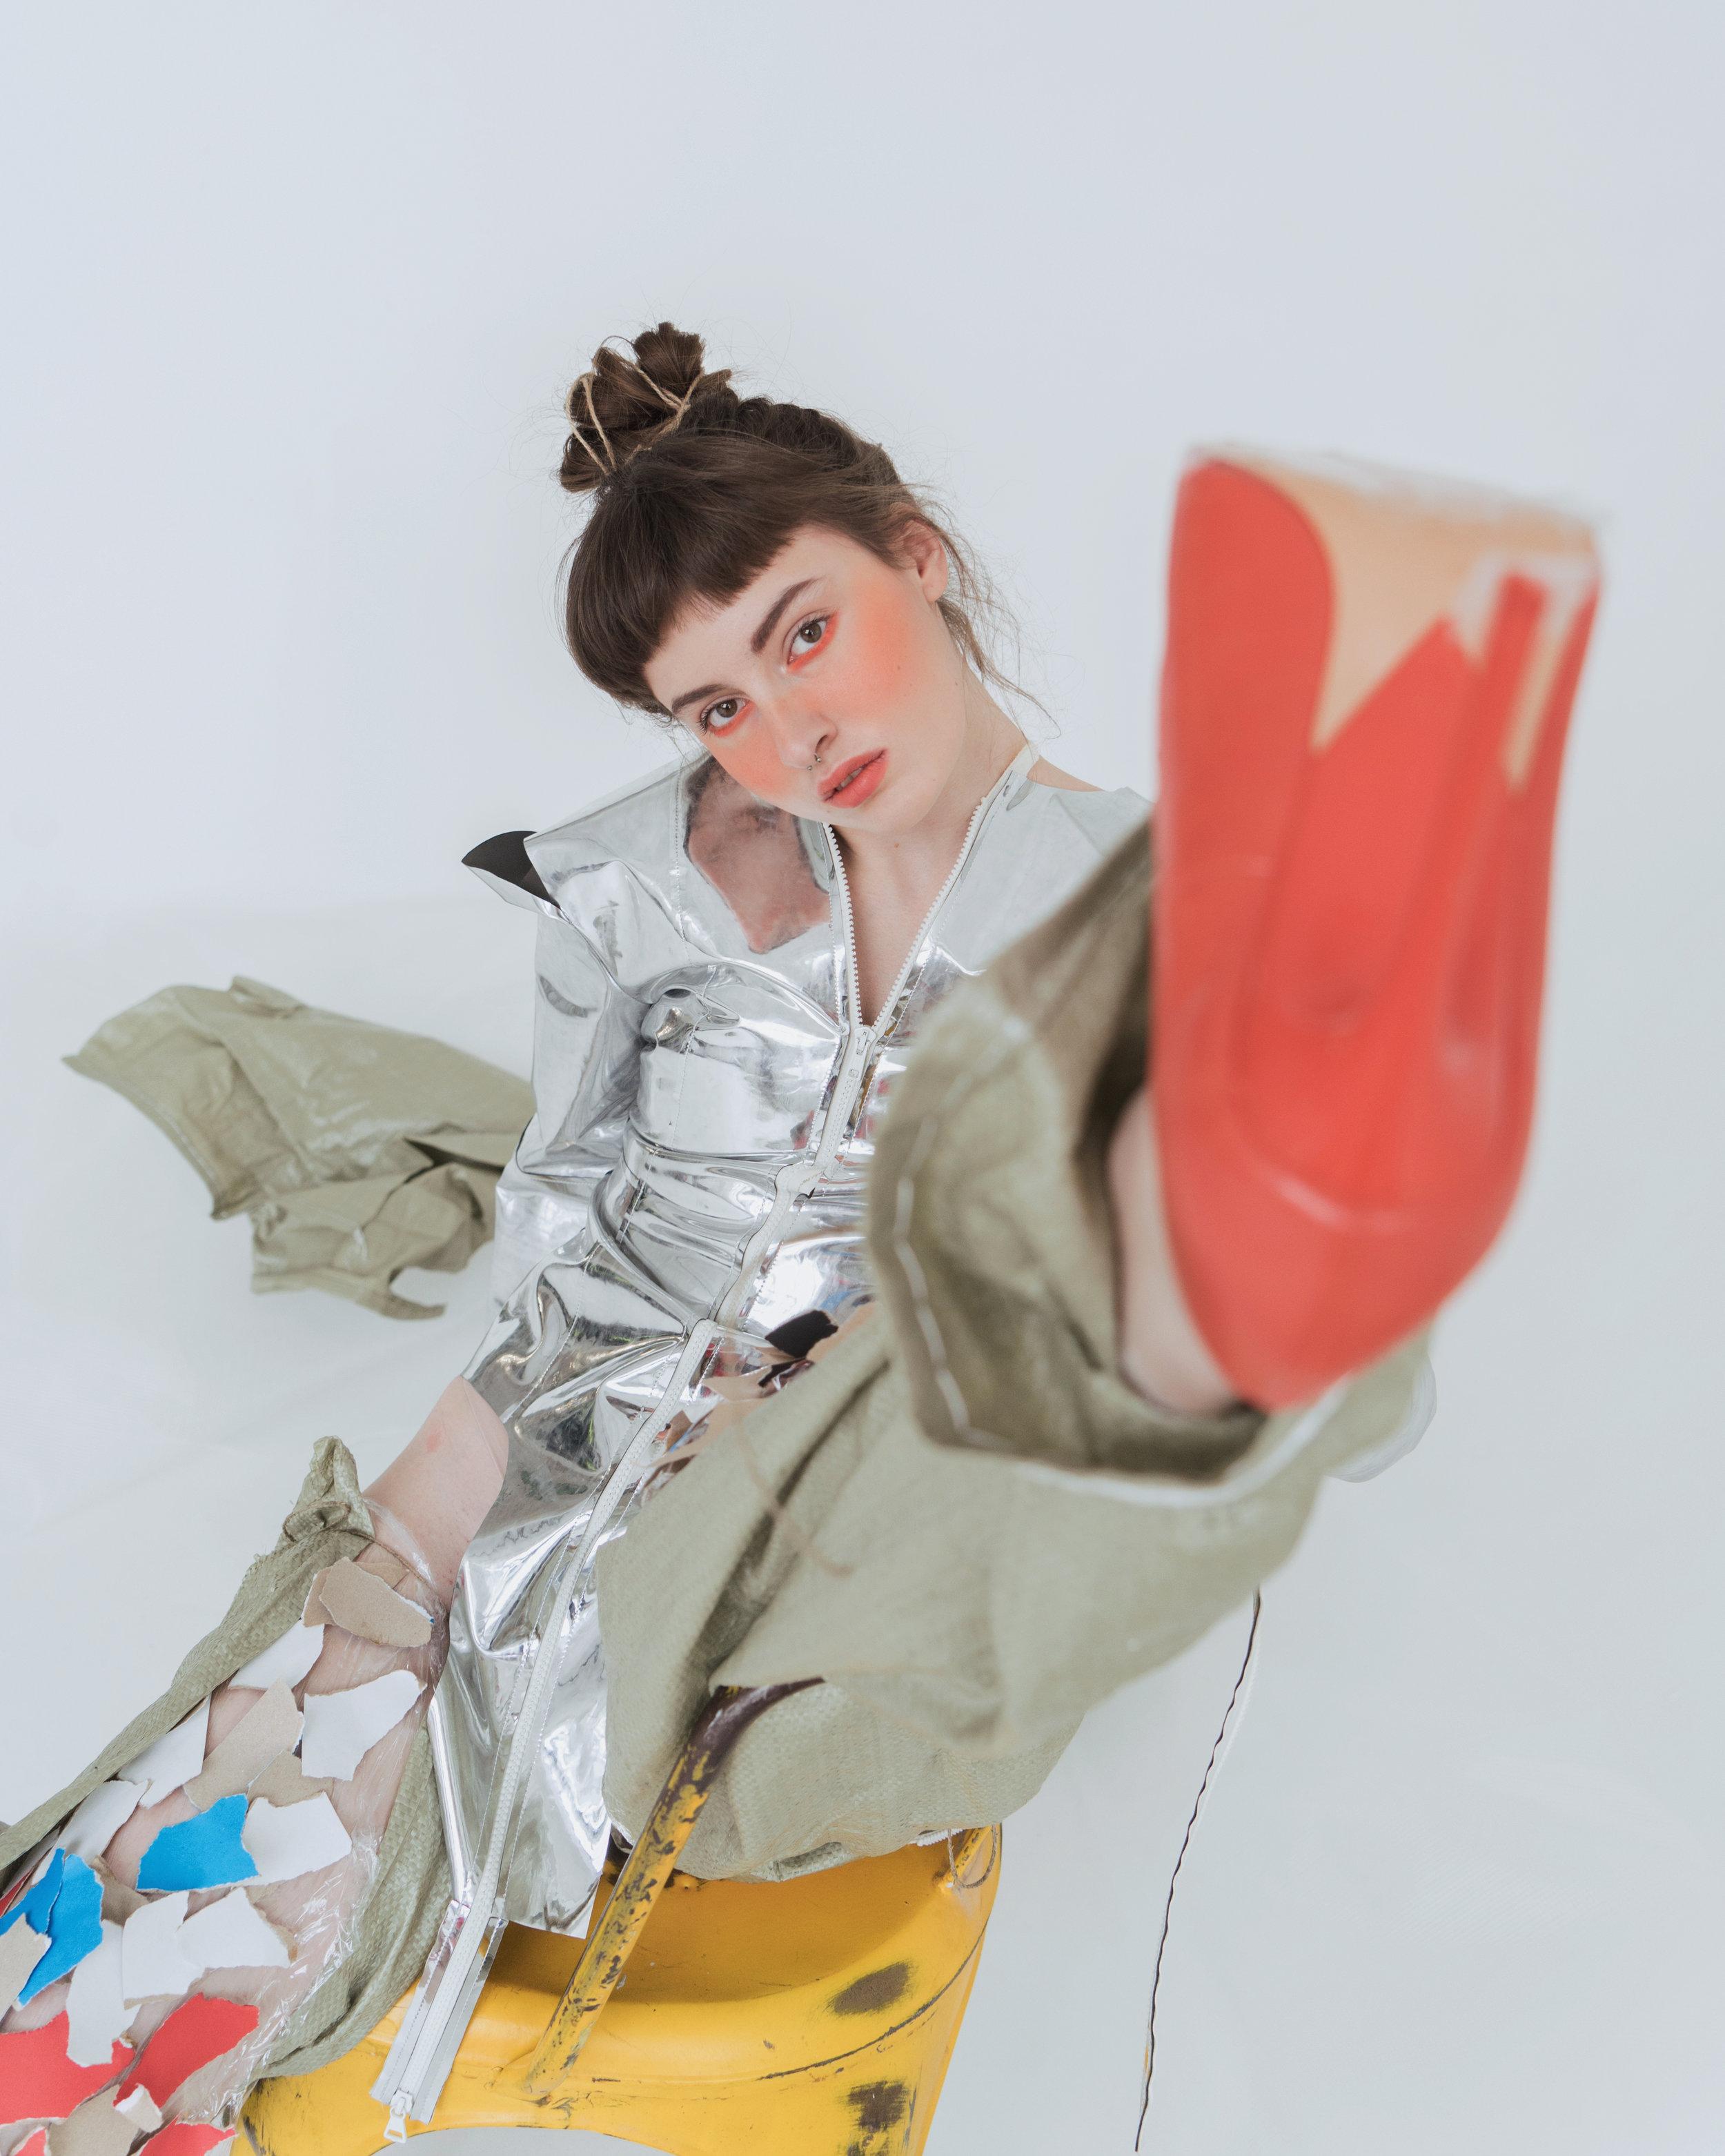 Jacket EVGENIYA BARKOVA @jackson_de_ville Shoes ZARA @zara